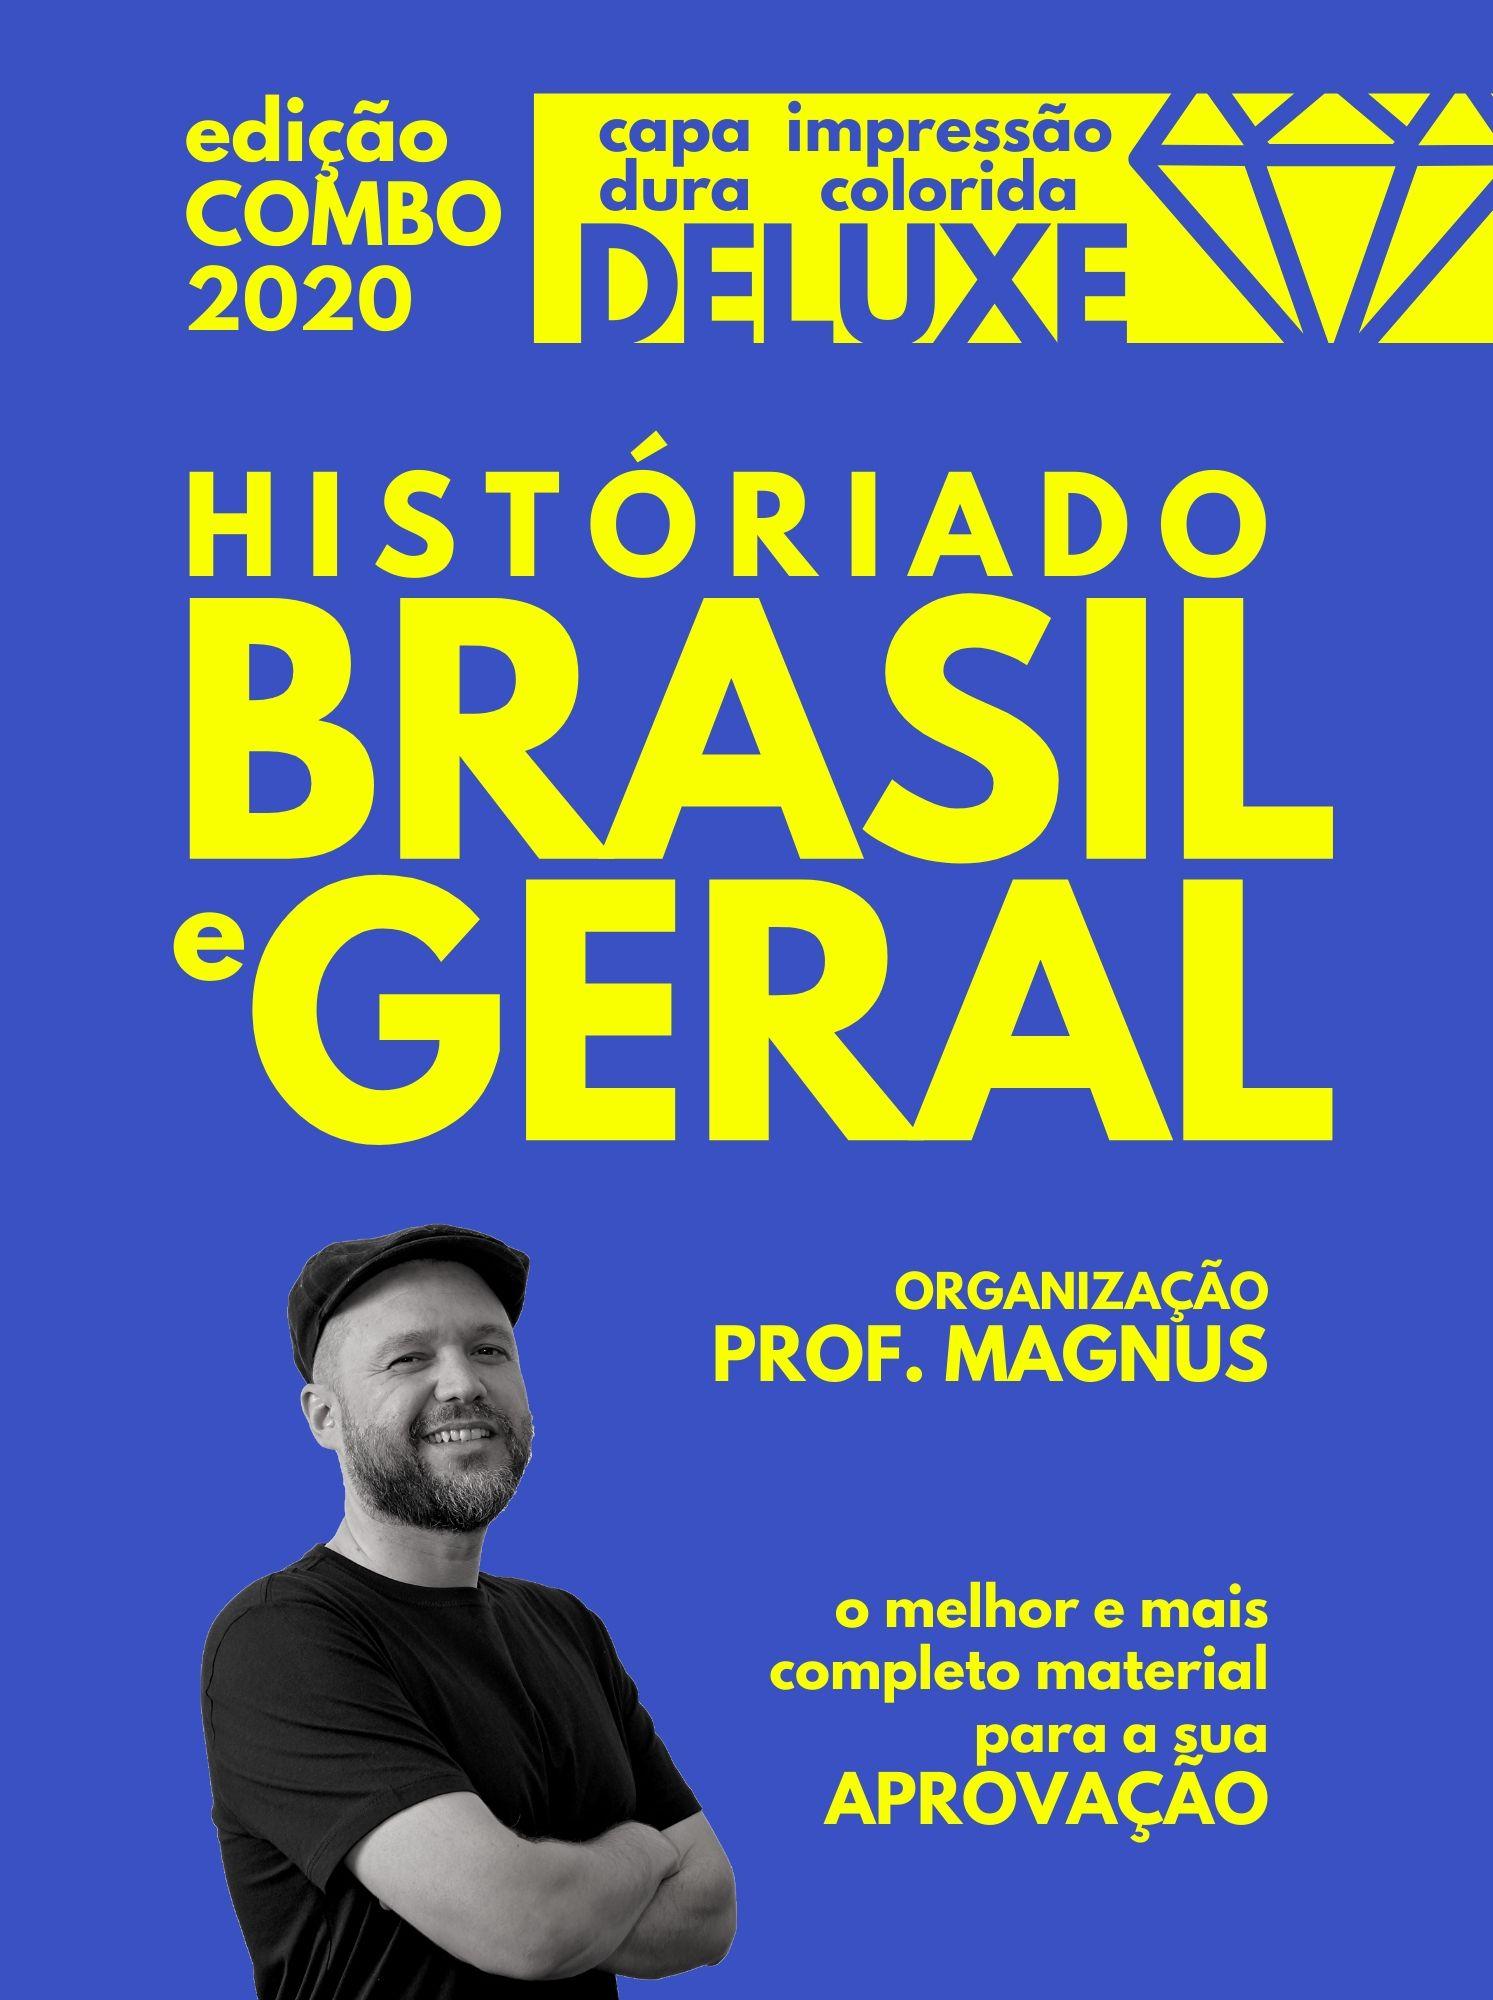 COMBO: vol. 1 e 2 [Brasil e Geral: edição deluxe]